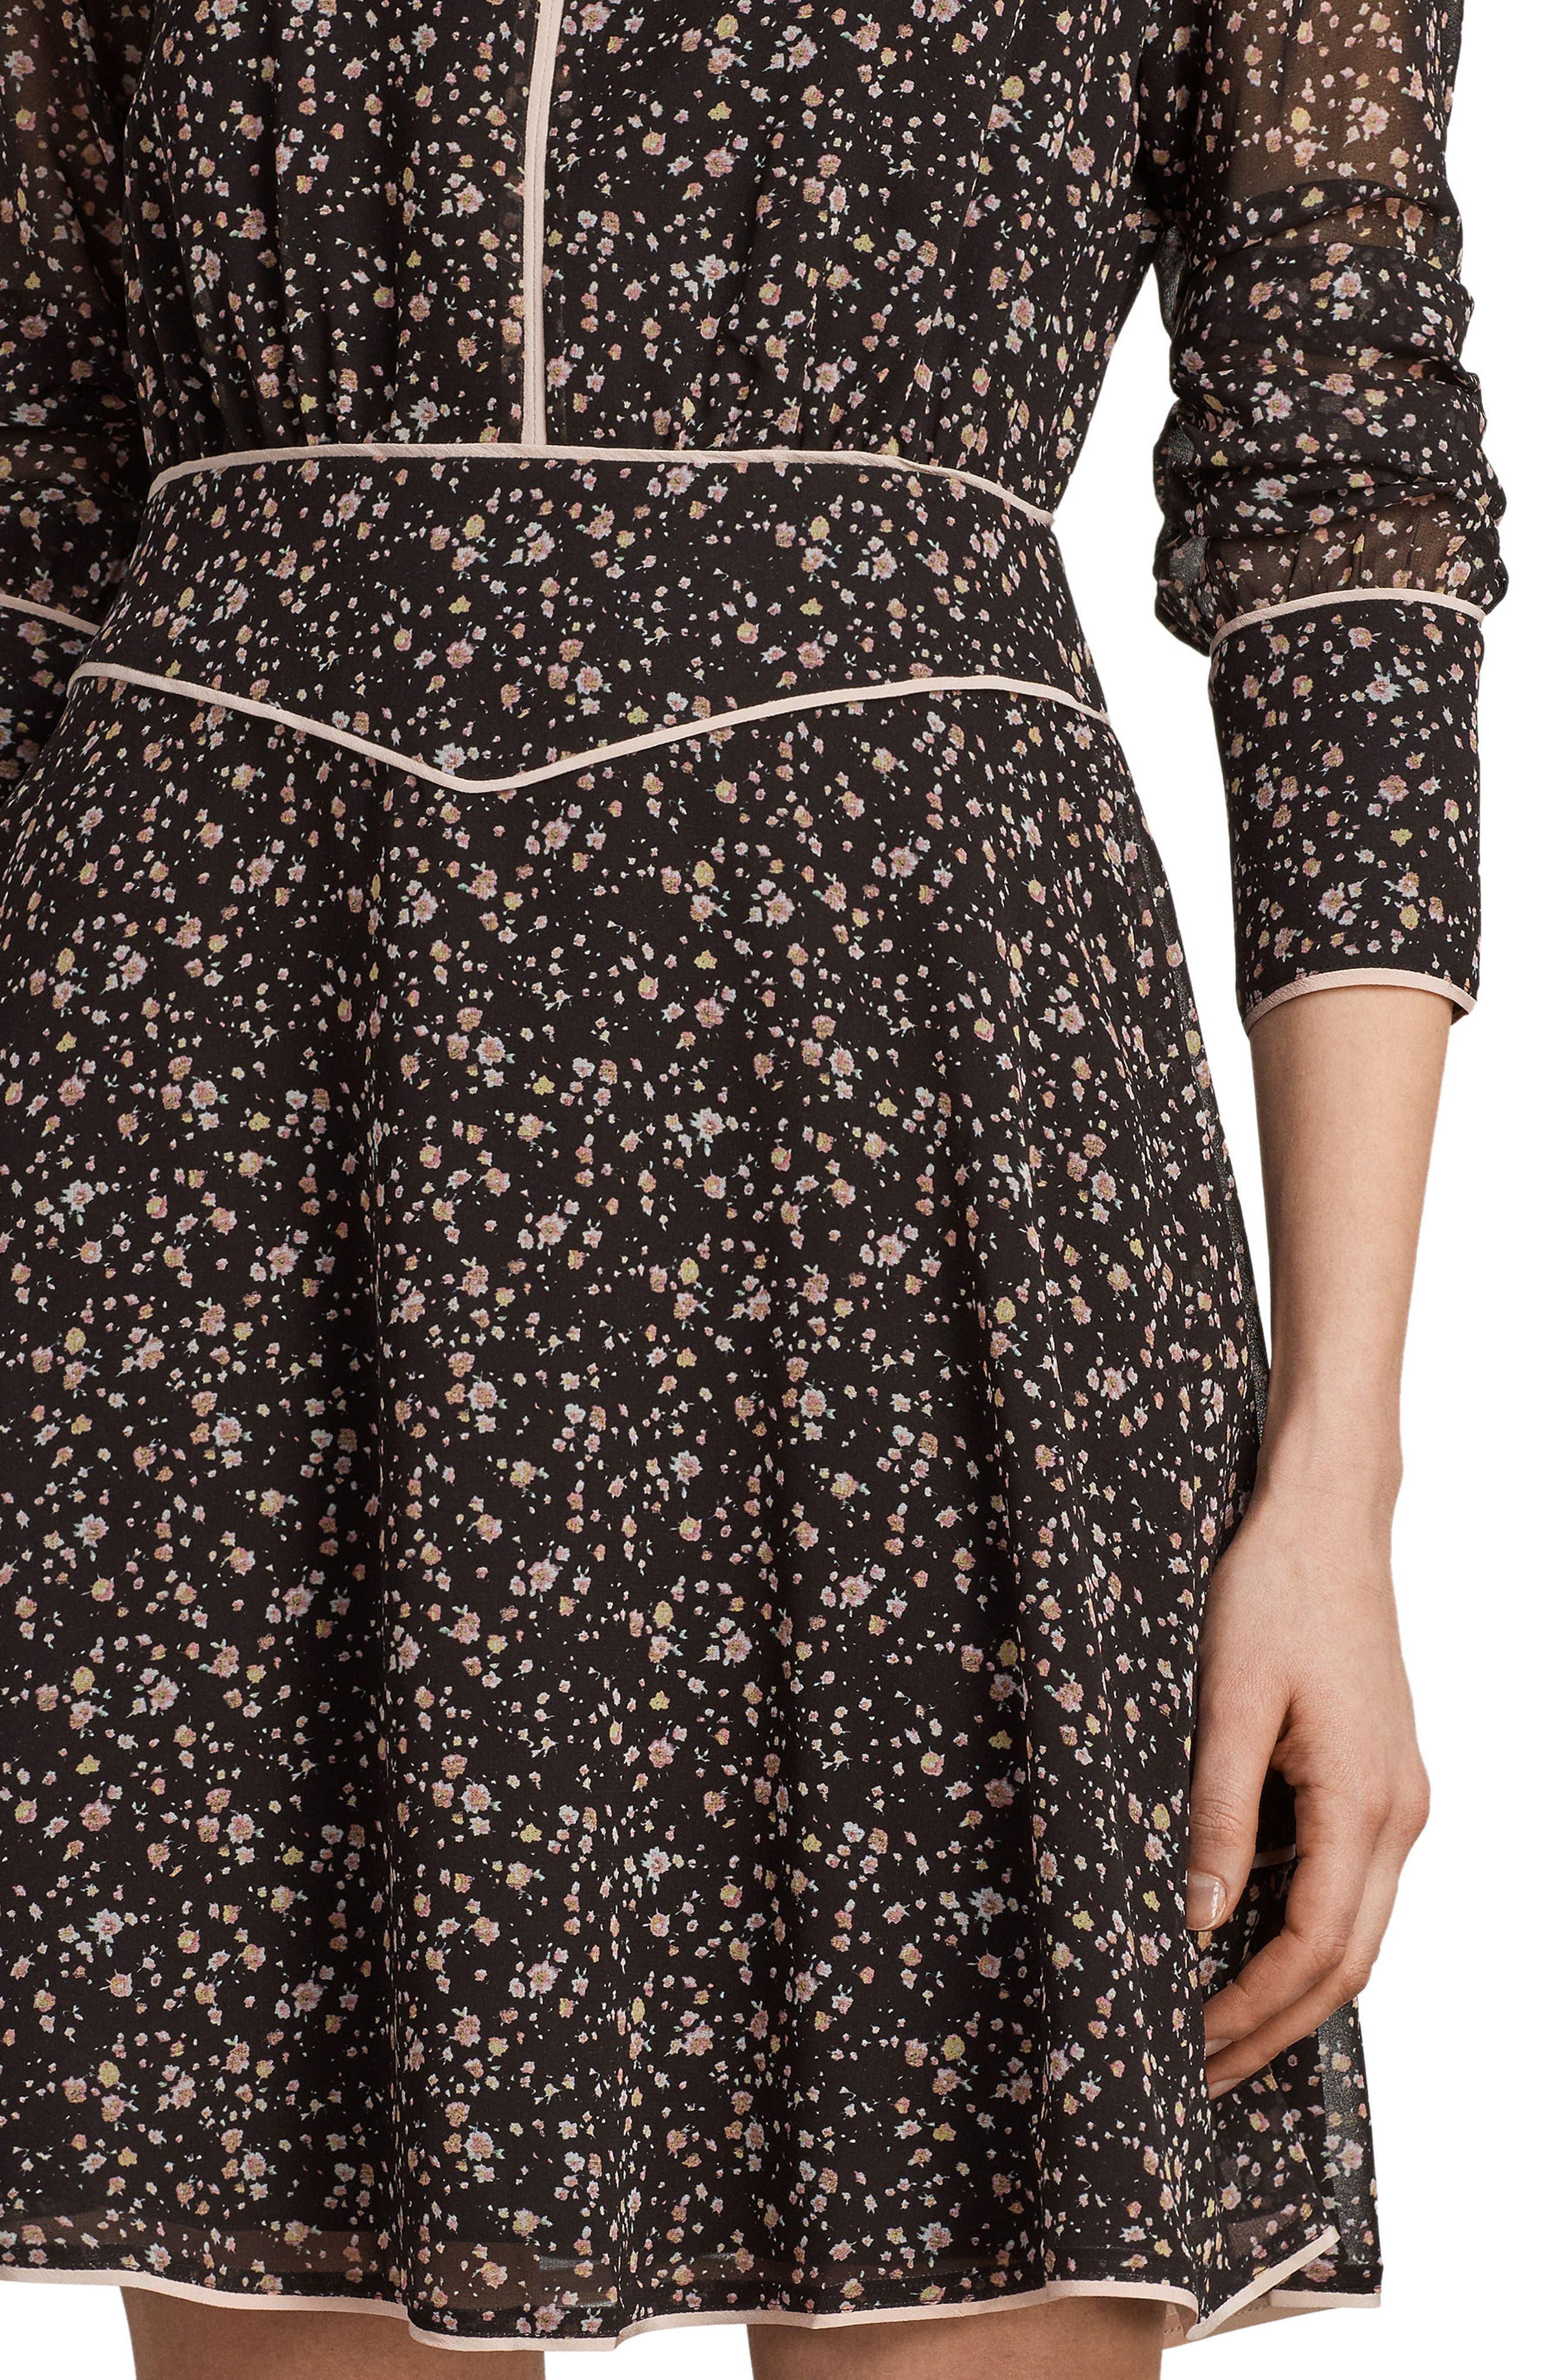 Kay Pepper Floral Print Dress,                             Alternate thumbnail 5, color,                             001